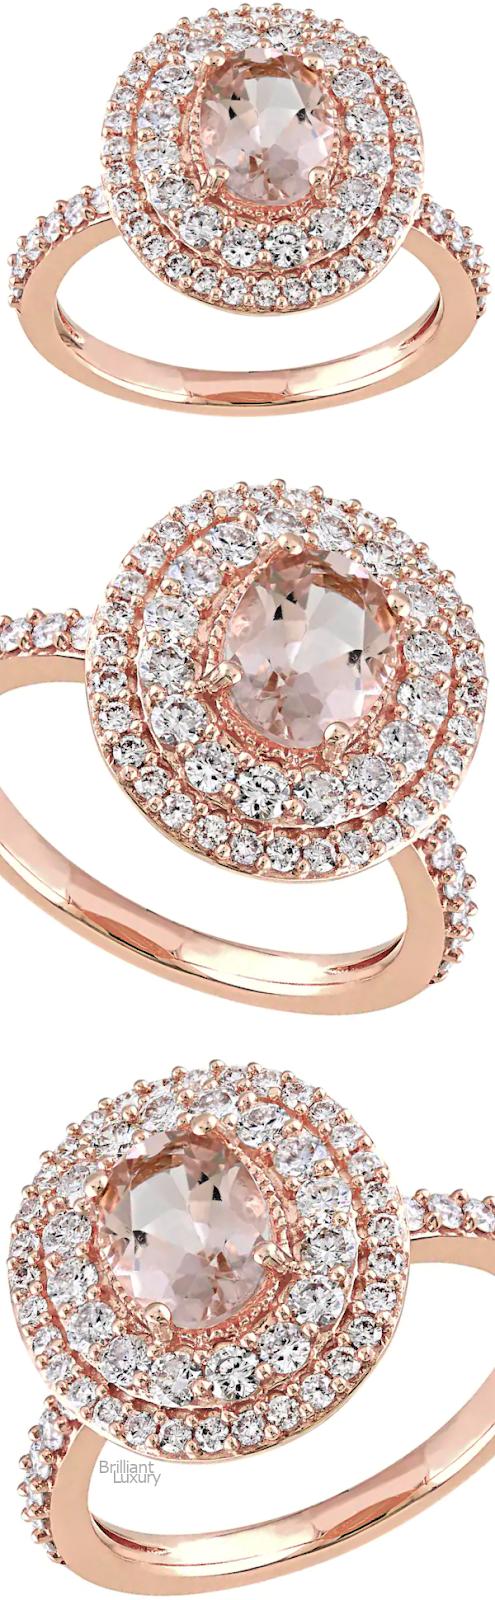 Brilliant Luxury♦Stella Grace 14k Rose Gold Morganite & 9-10 Carat T.W. Diamond Oval Halo Engagement Ring